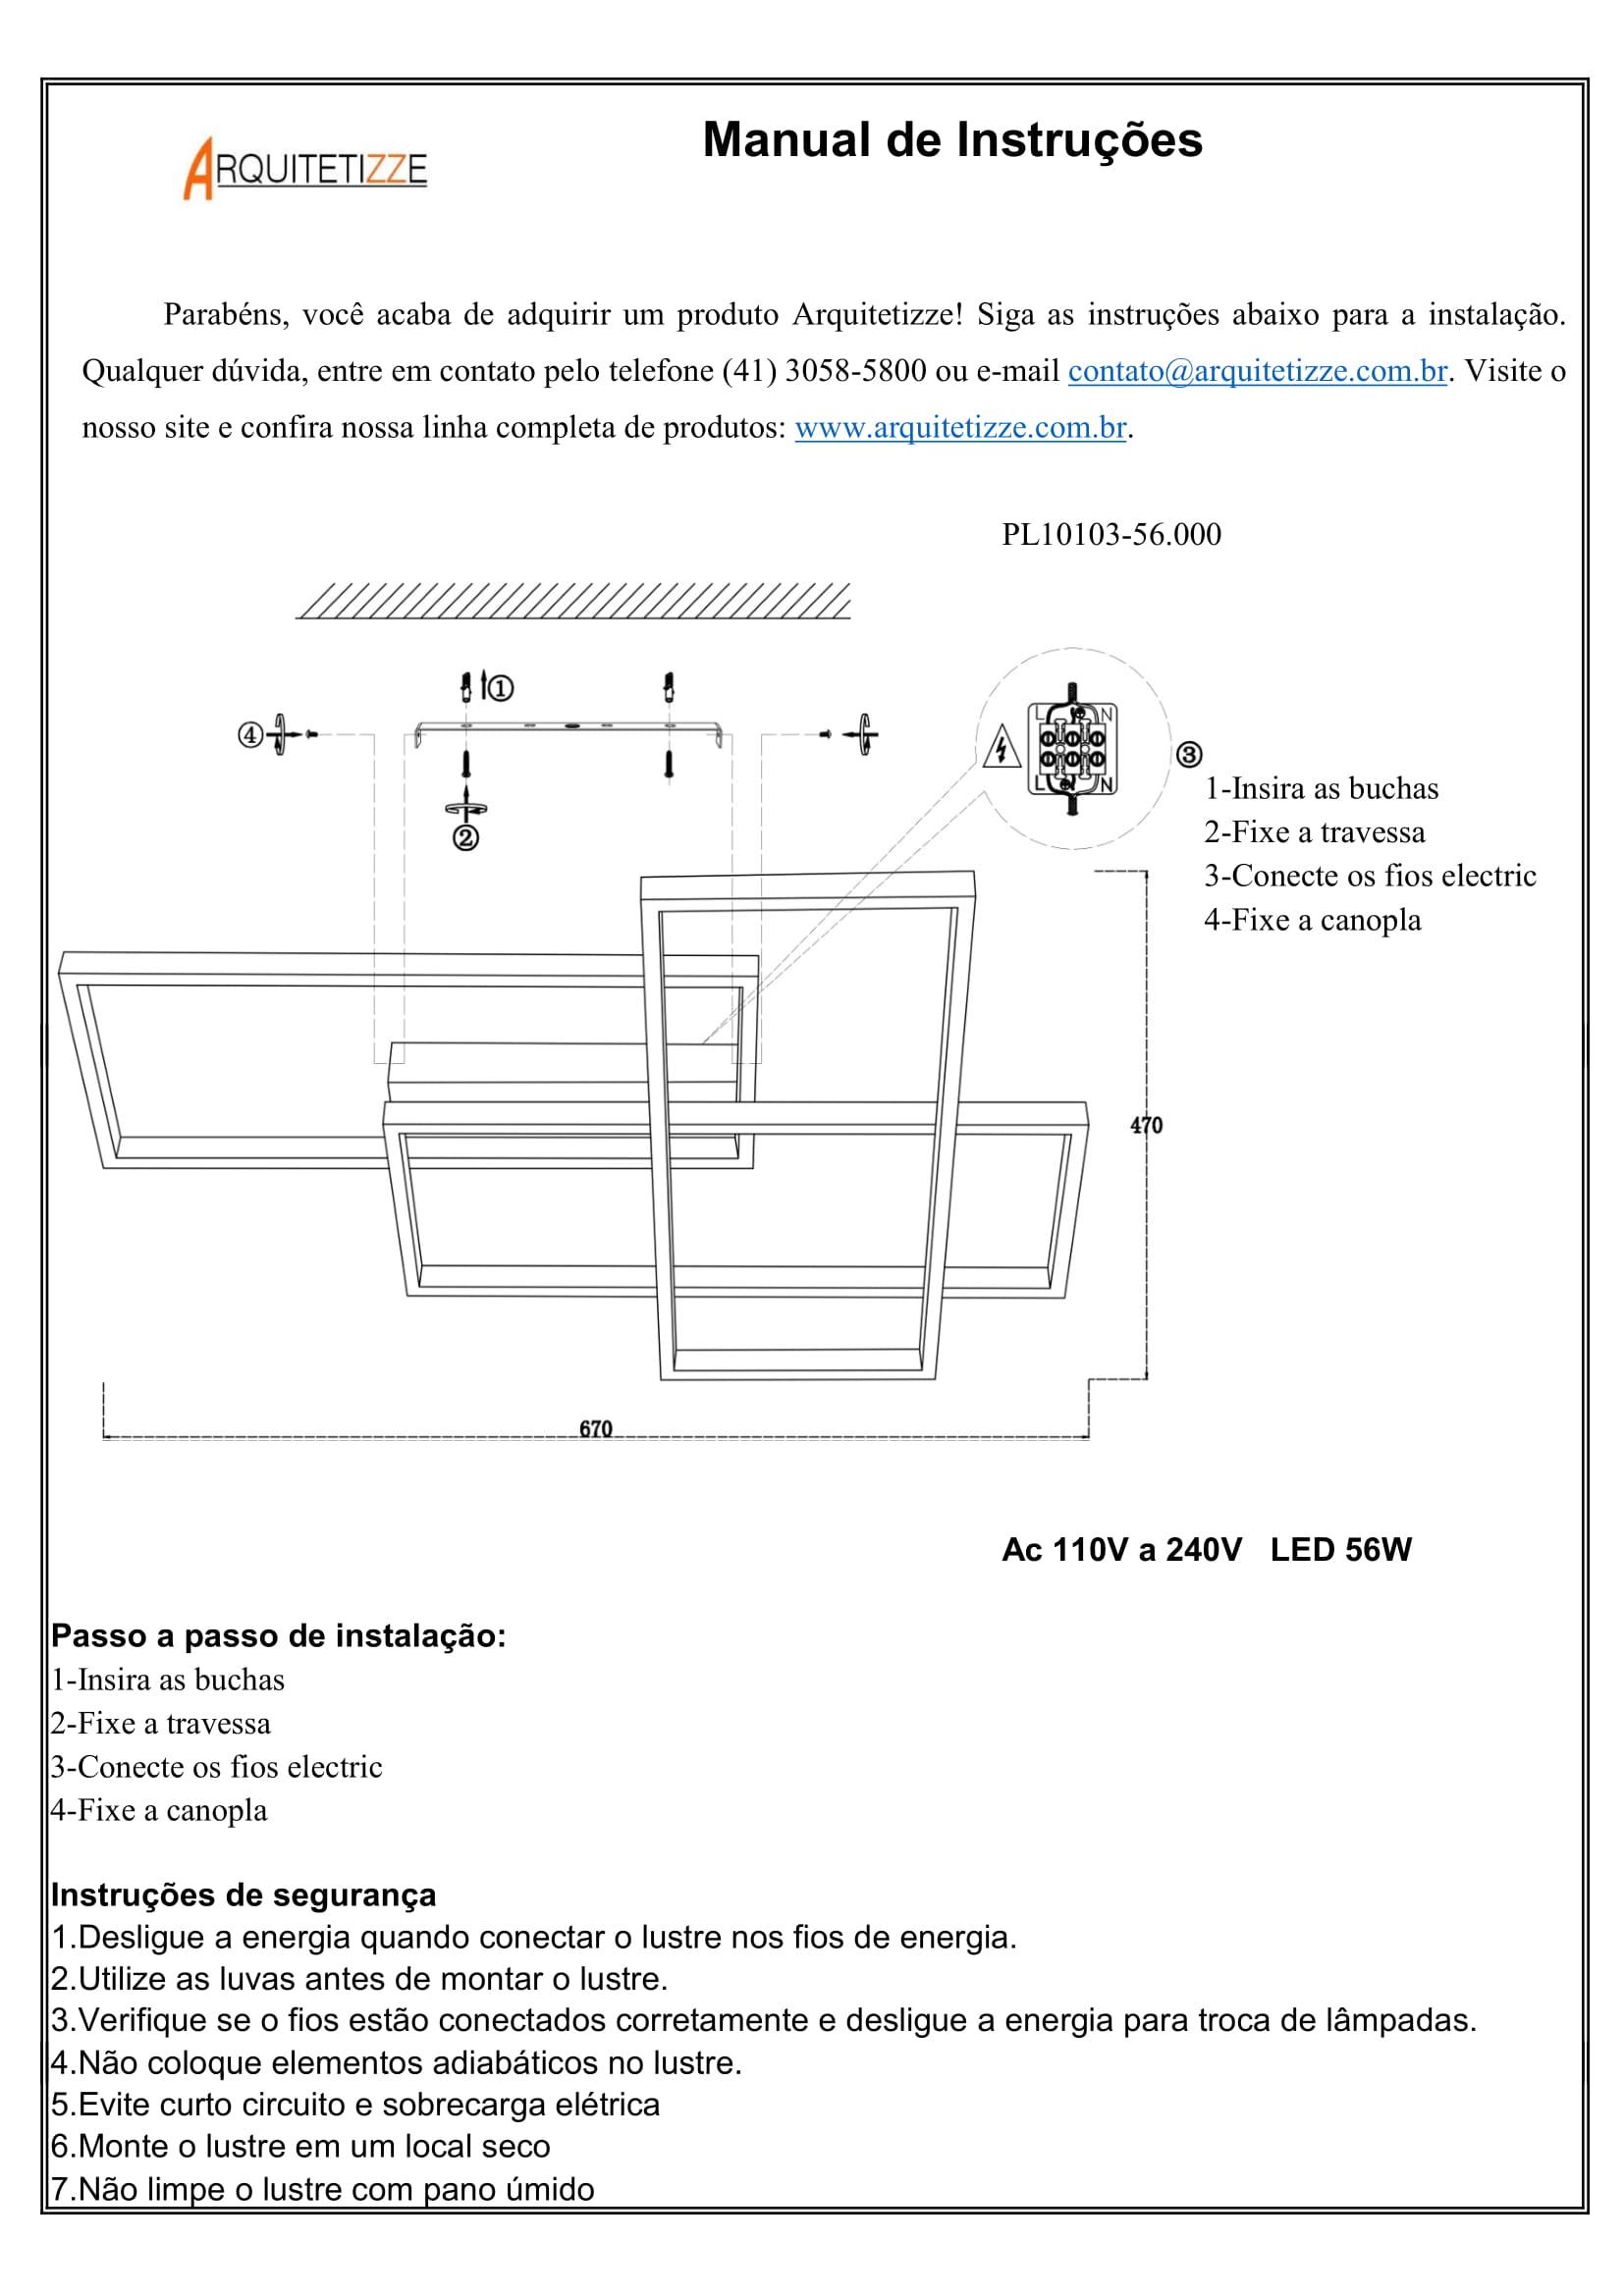 PLAFON QUADRA EM ALUMÍNIO BRANCO PL10103-56.000